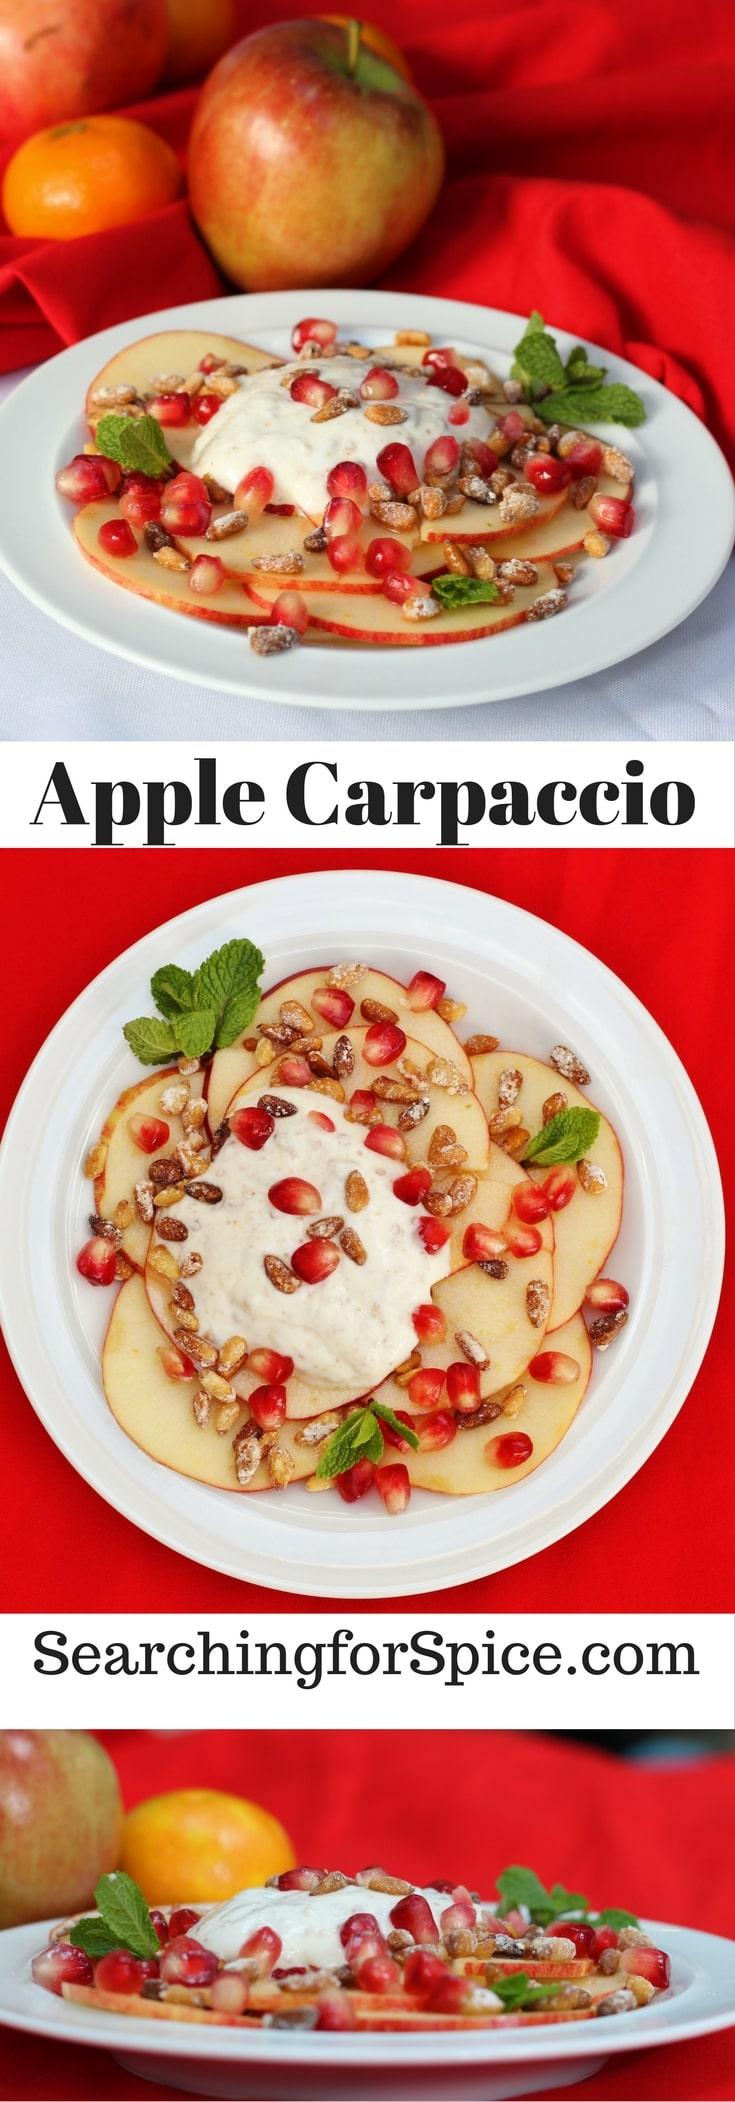 Apple Carpaccio